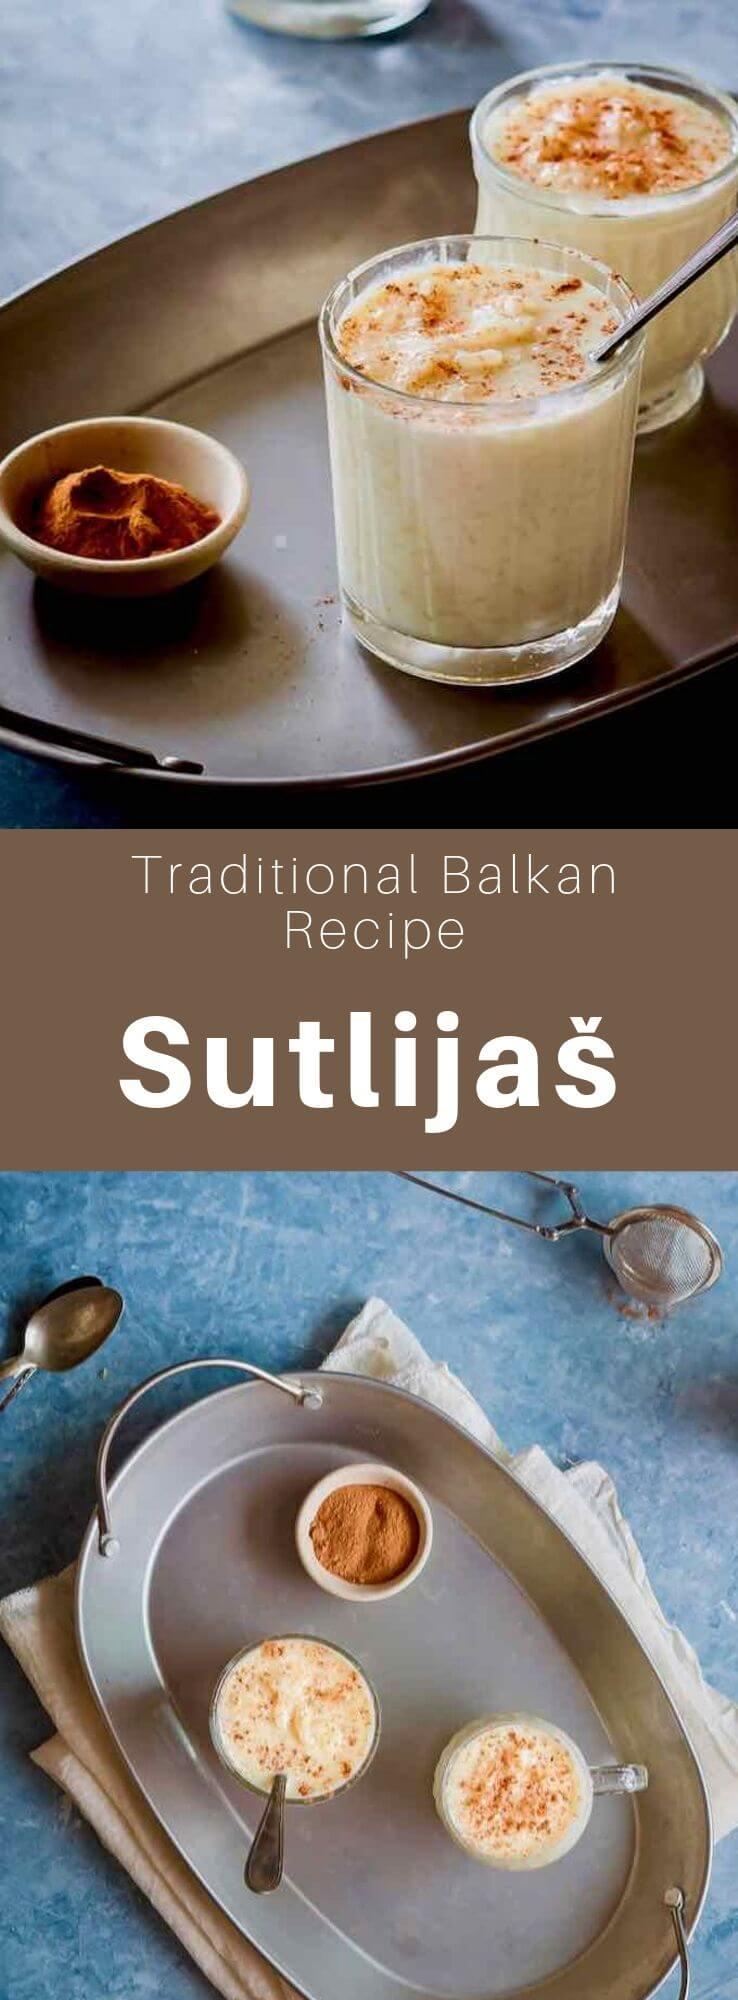 Sutlijaš or sutlija is a sweet, cinnamon-flavored rice pudding typical of the Balkans and Turkey. #Balkan #BalkanCuisine #BalkanRecipe #Turkey #TurkishCuisine #WorldCuisine #196flavors